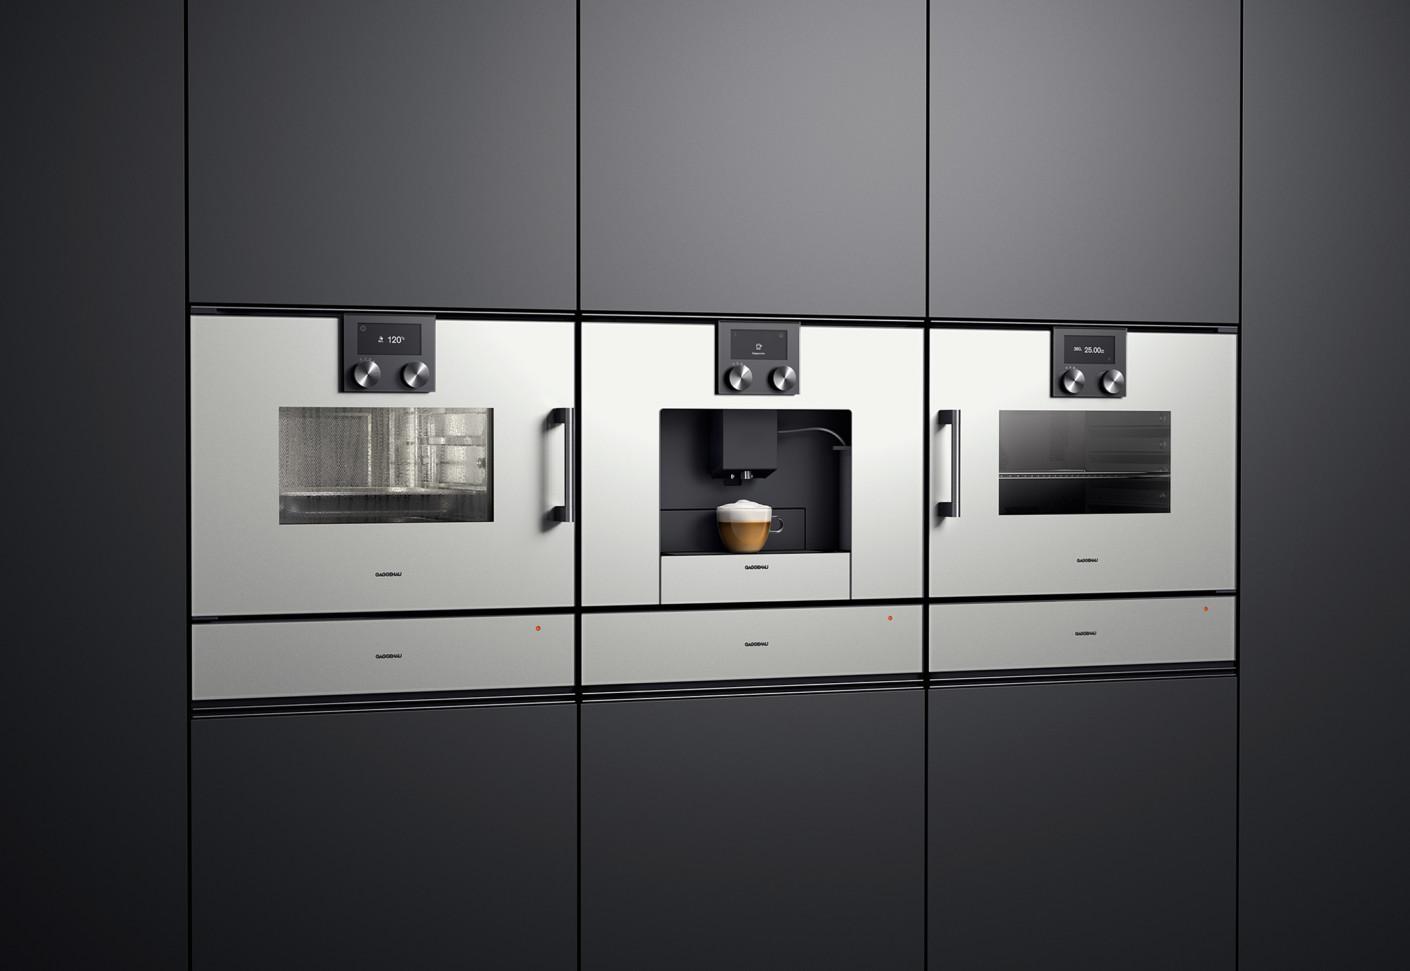 Oven Series 200 By Gaggenau Stylepark